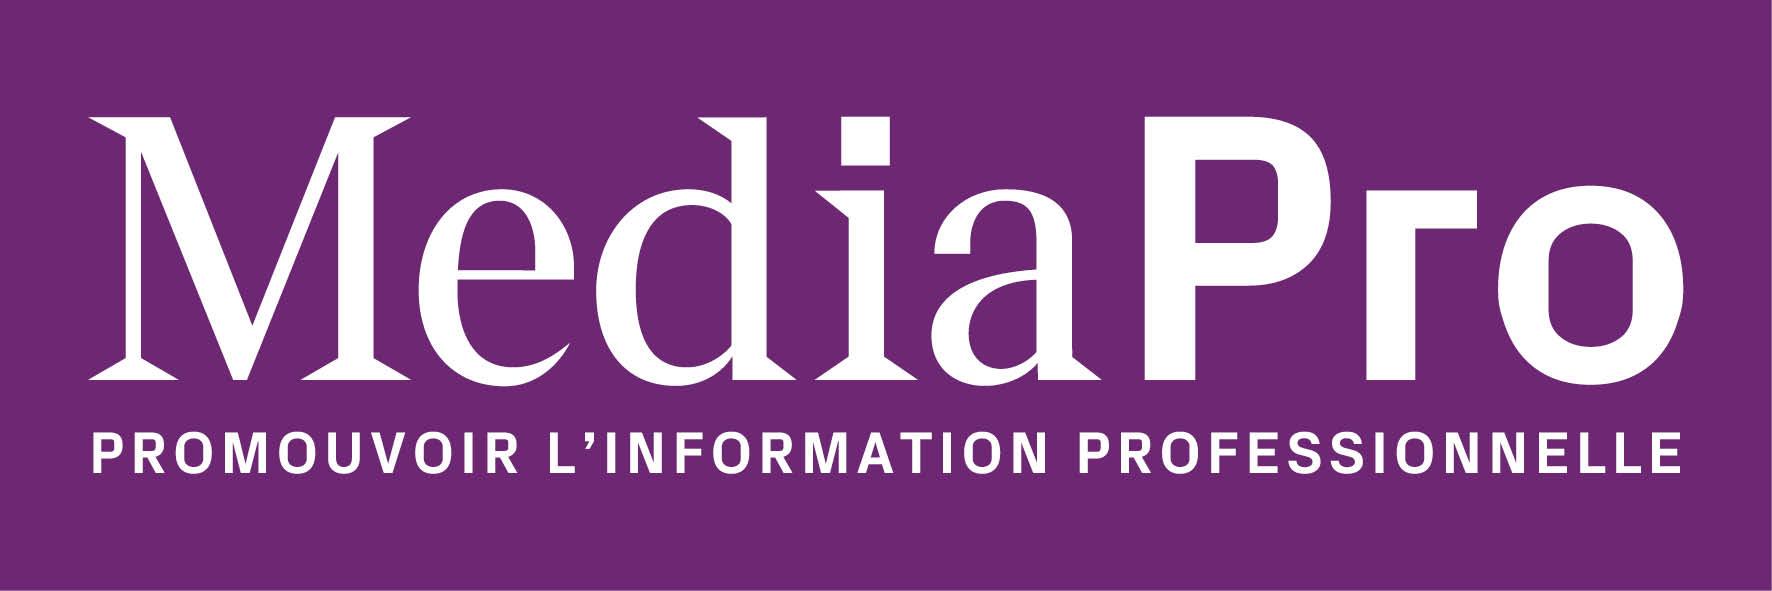 Média Pro